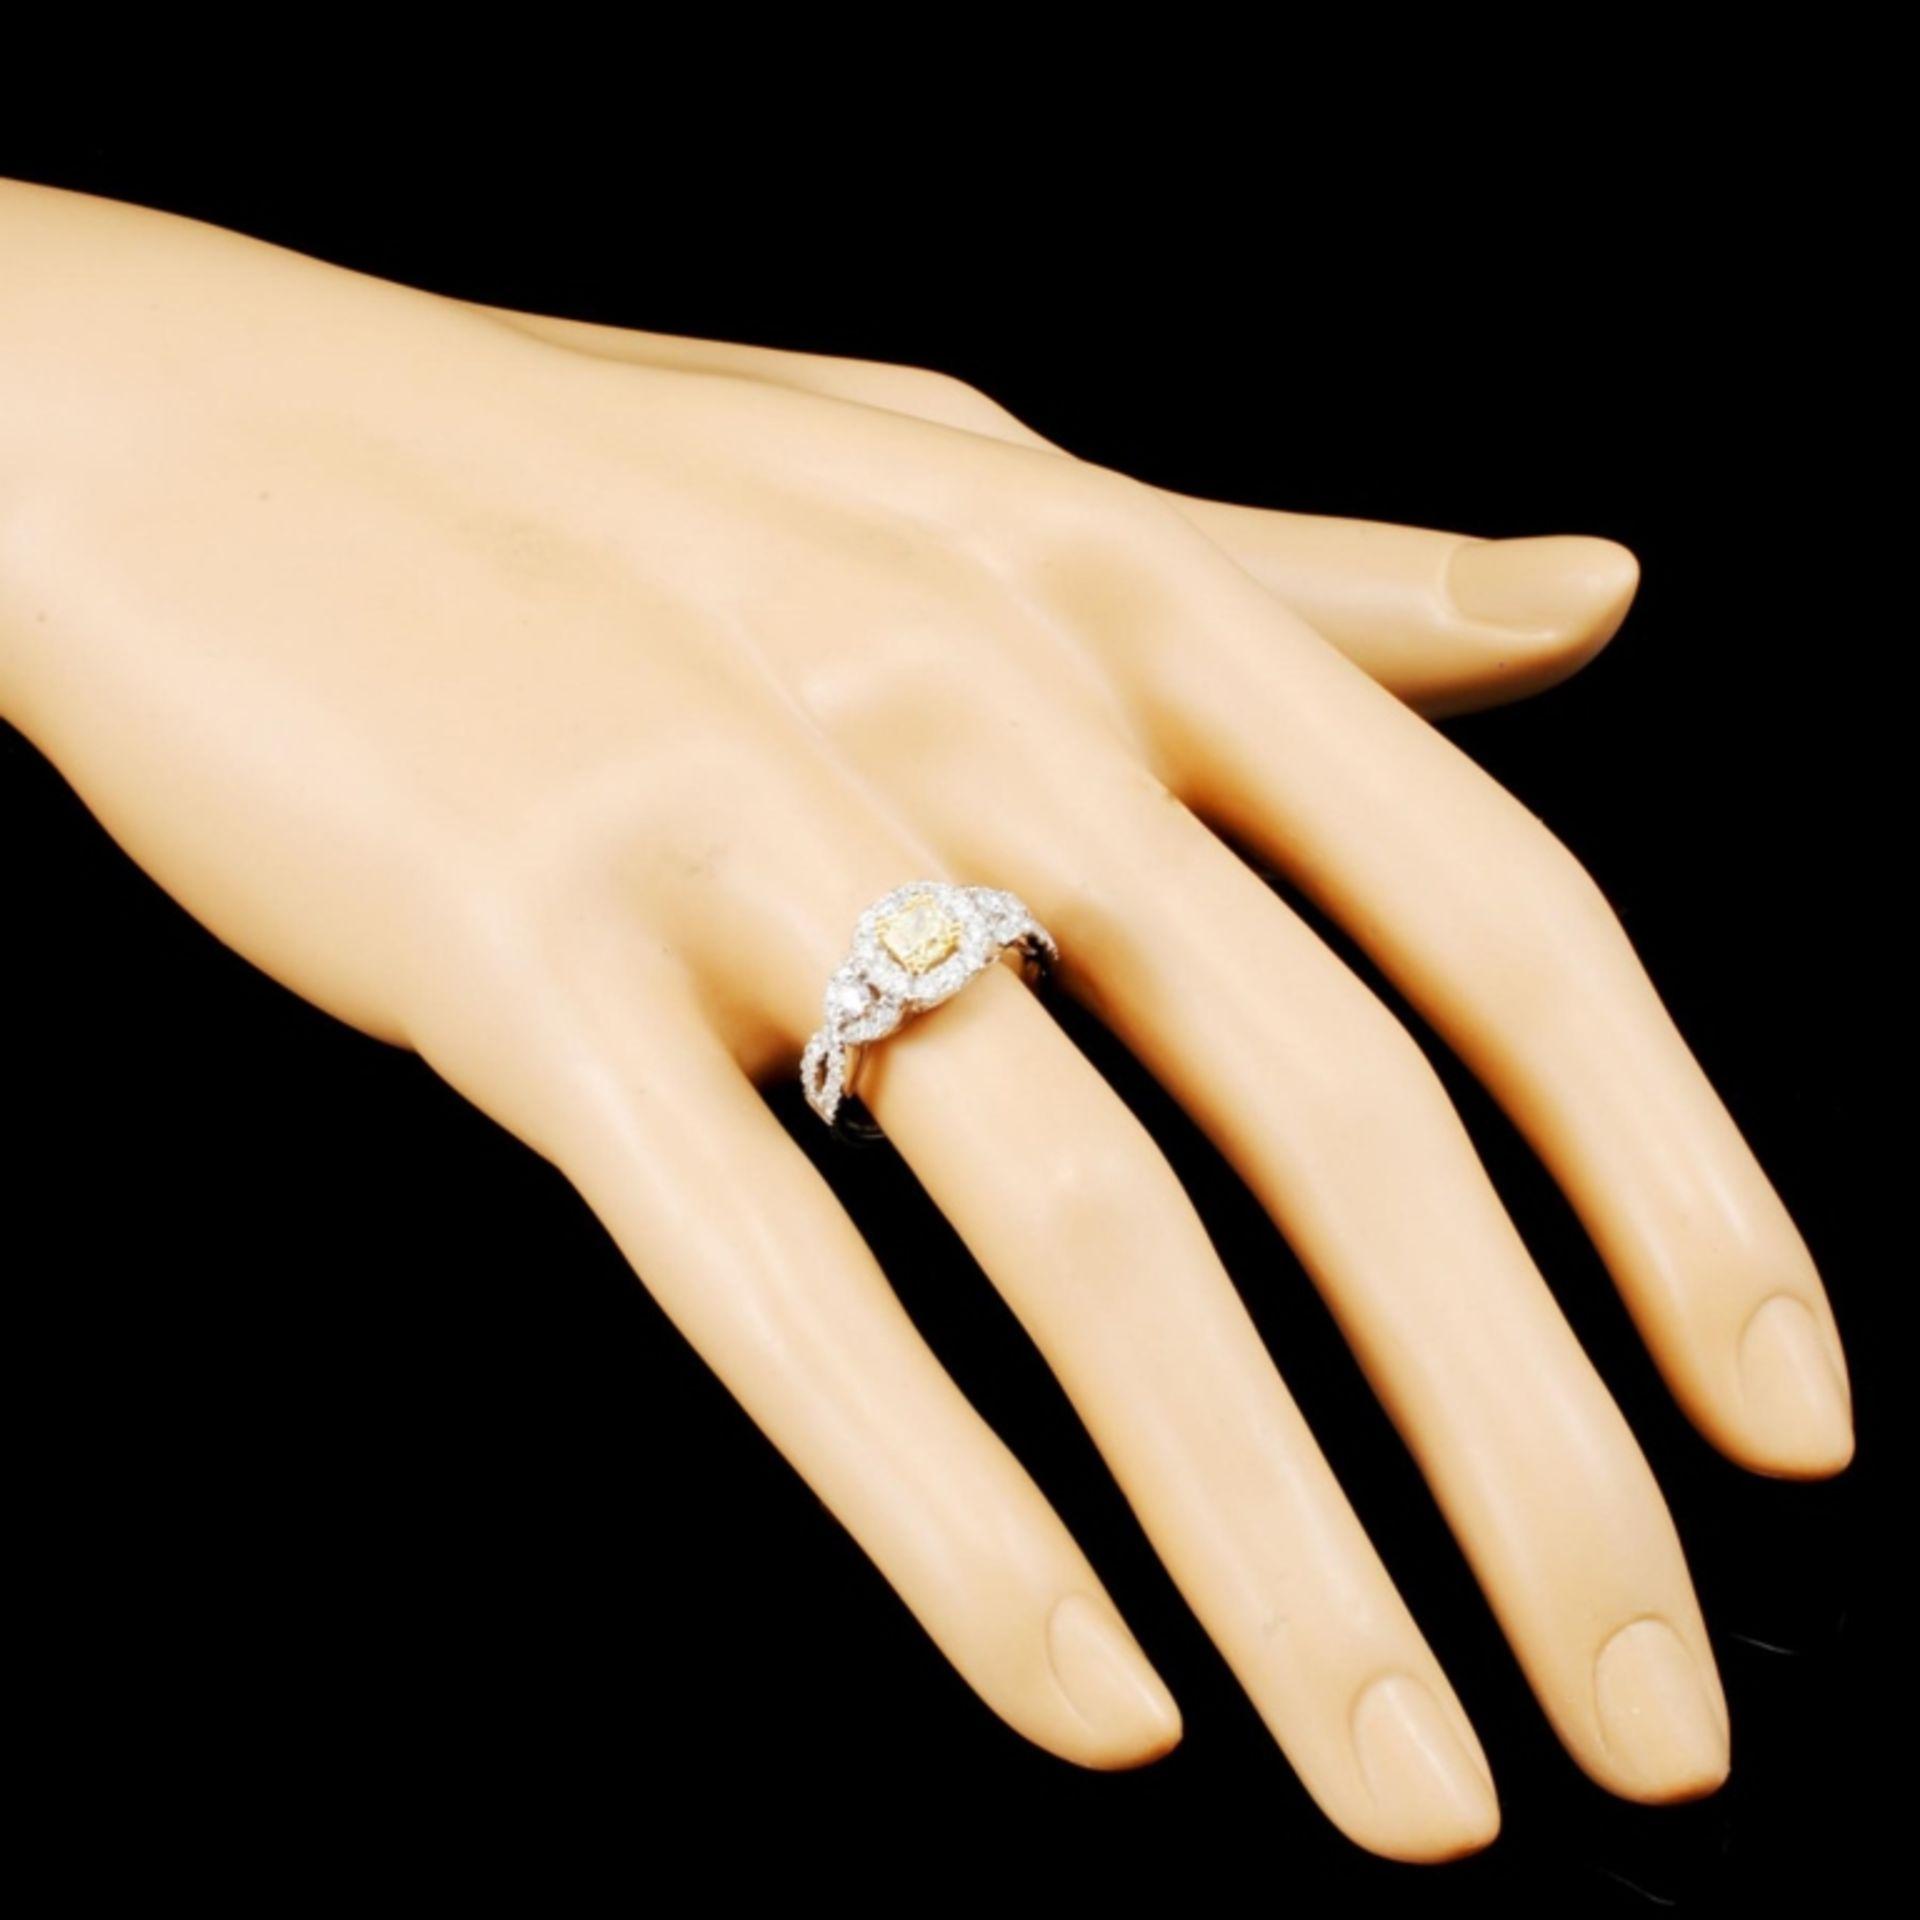 18K Gold 1.31ctw Diamond Ring - Image 3 of 5